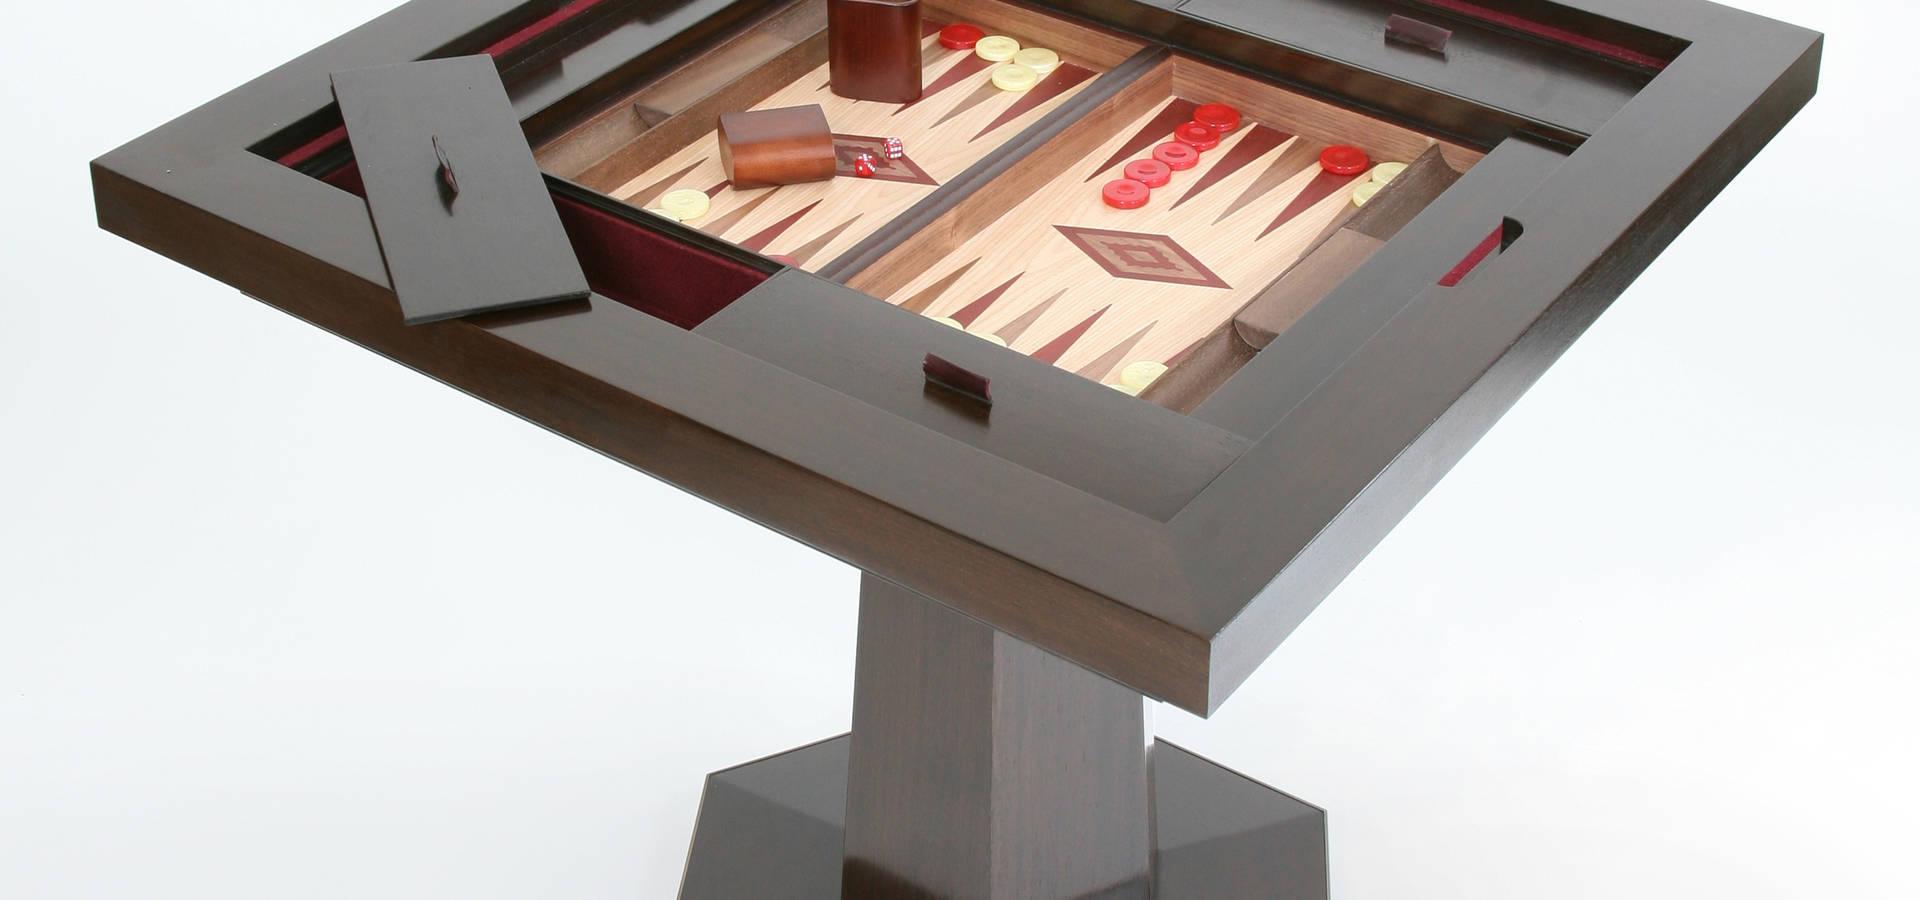 Bespoke furniture commissions by rupert bevan ltd homify for Bespoke furniture